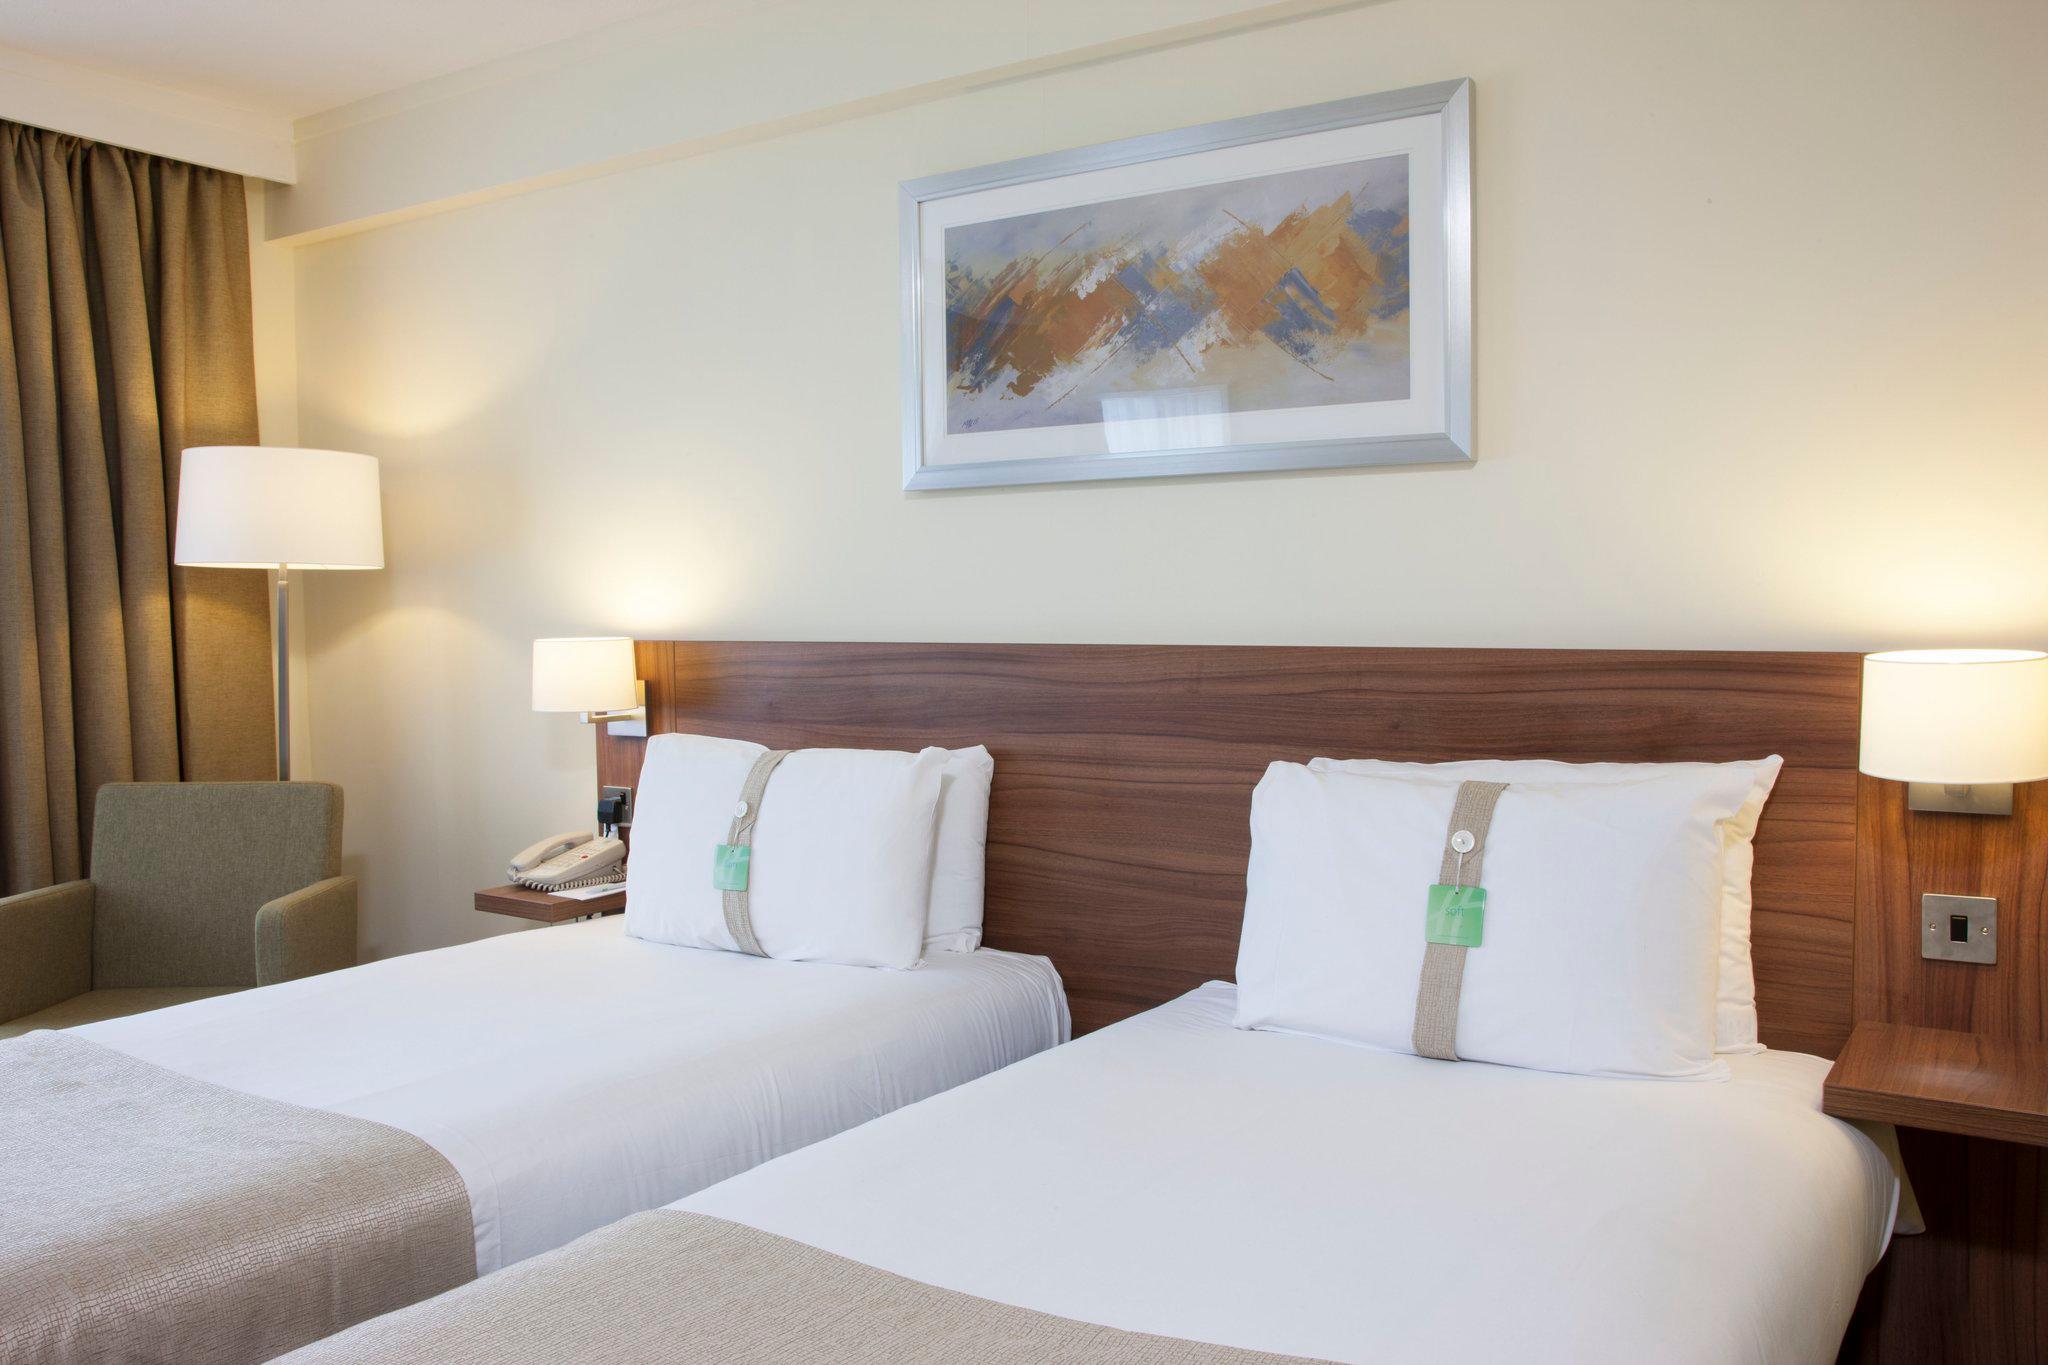 Holiday Inn Rochester - Chatham, an IHG Hotel